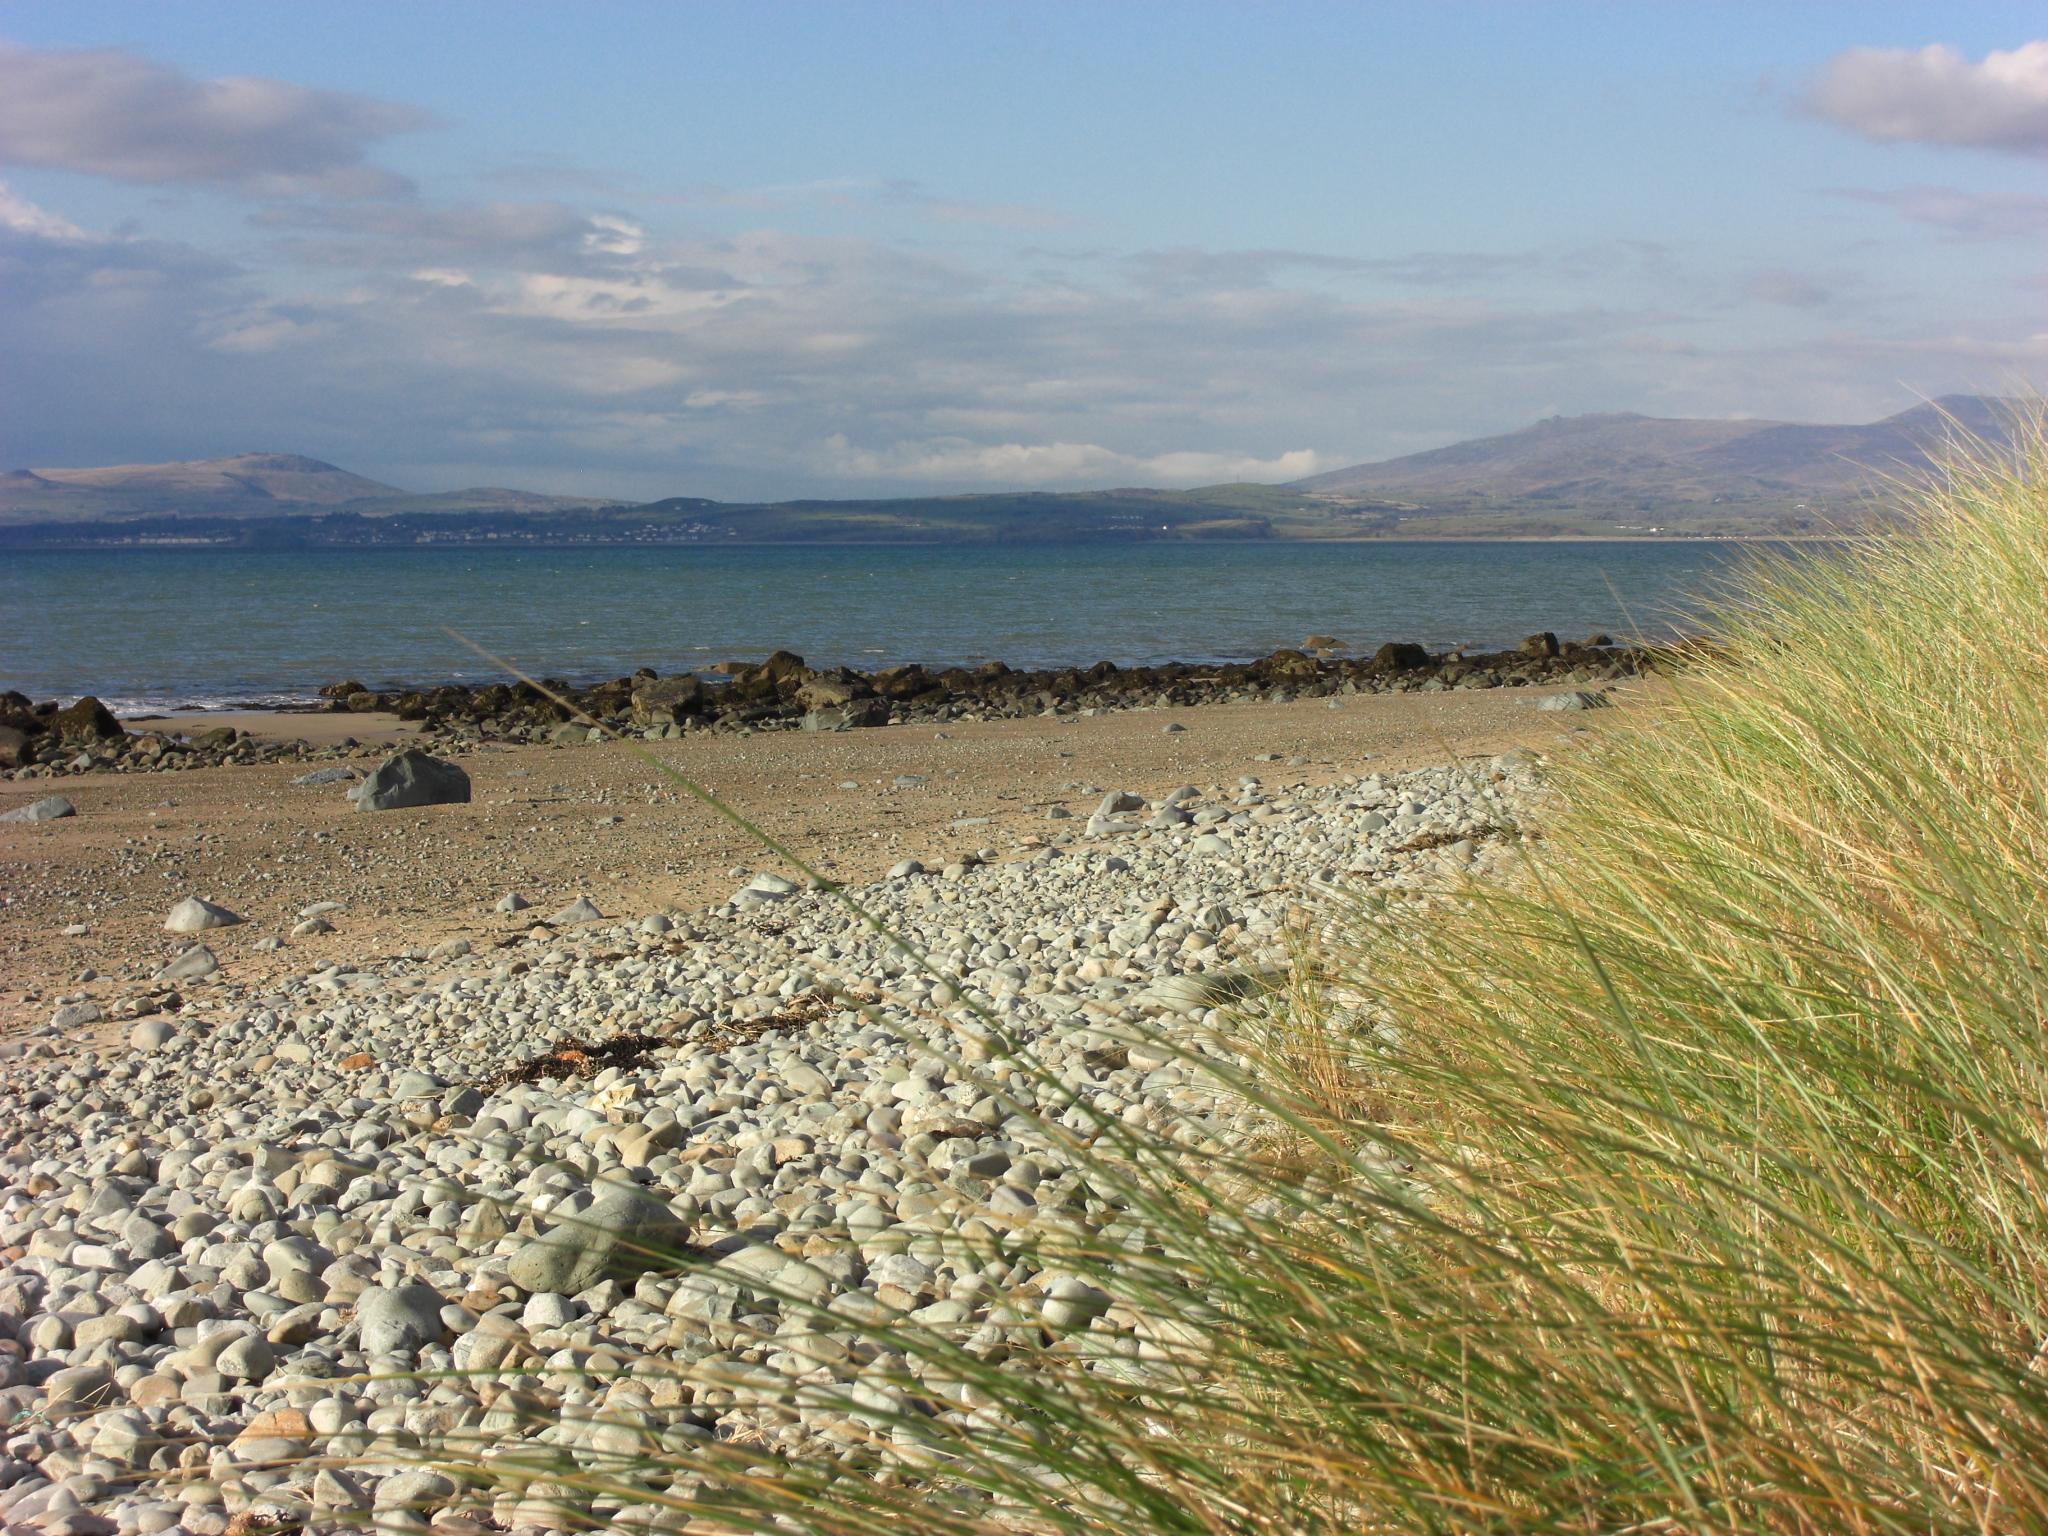 View from Llandanwg beach towards Criccieth